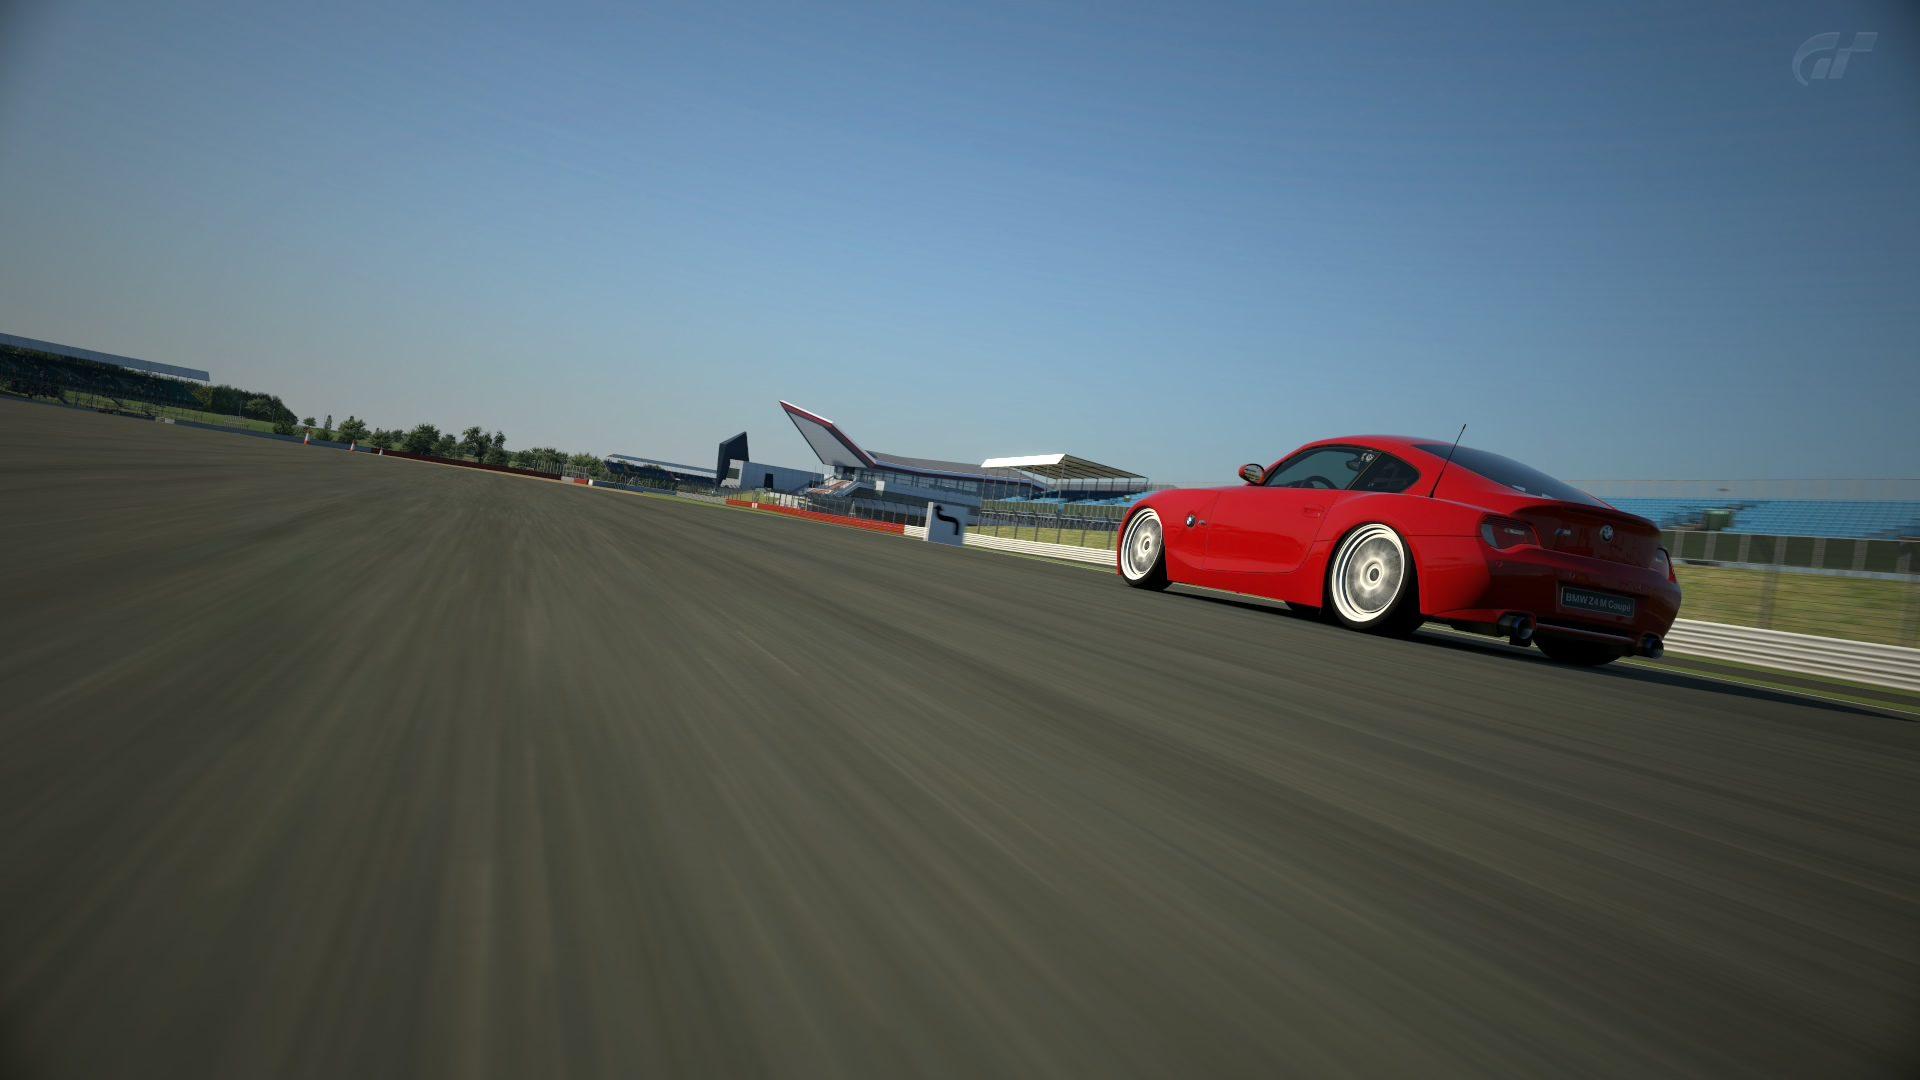 BMW Z4 Silverstone Grand Prix Circuit_4.jpg